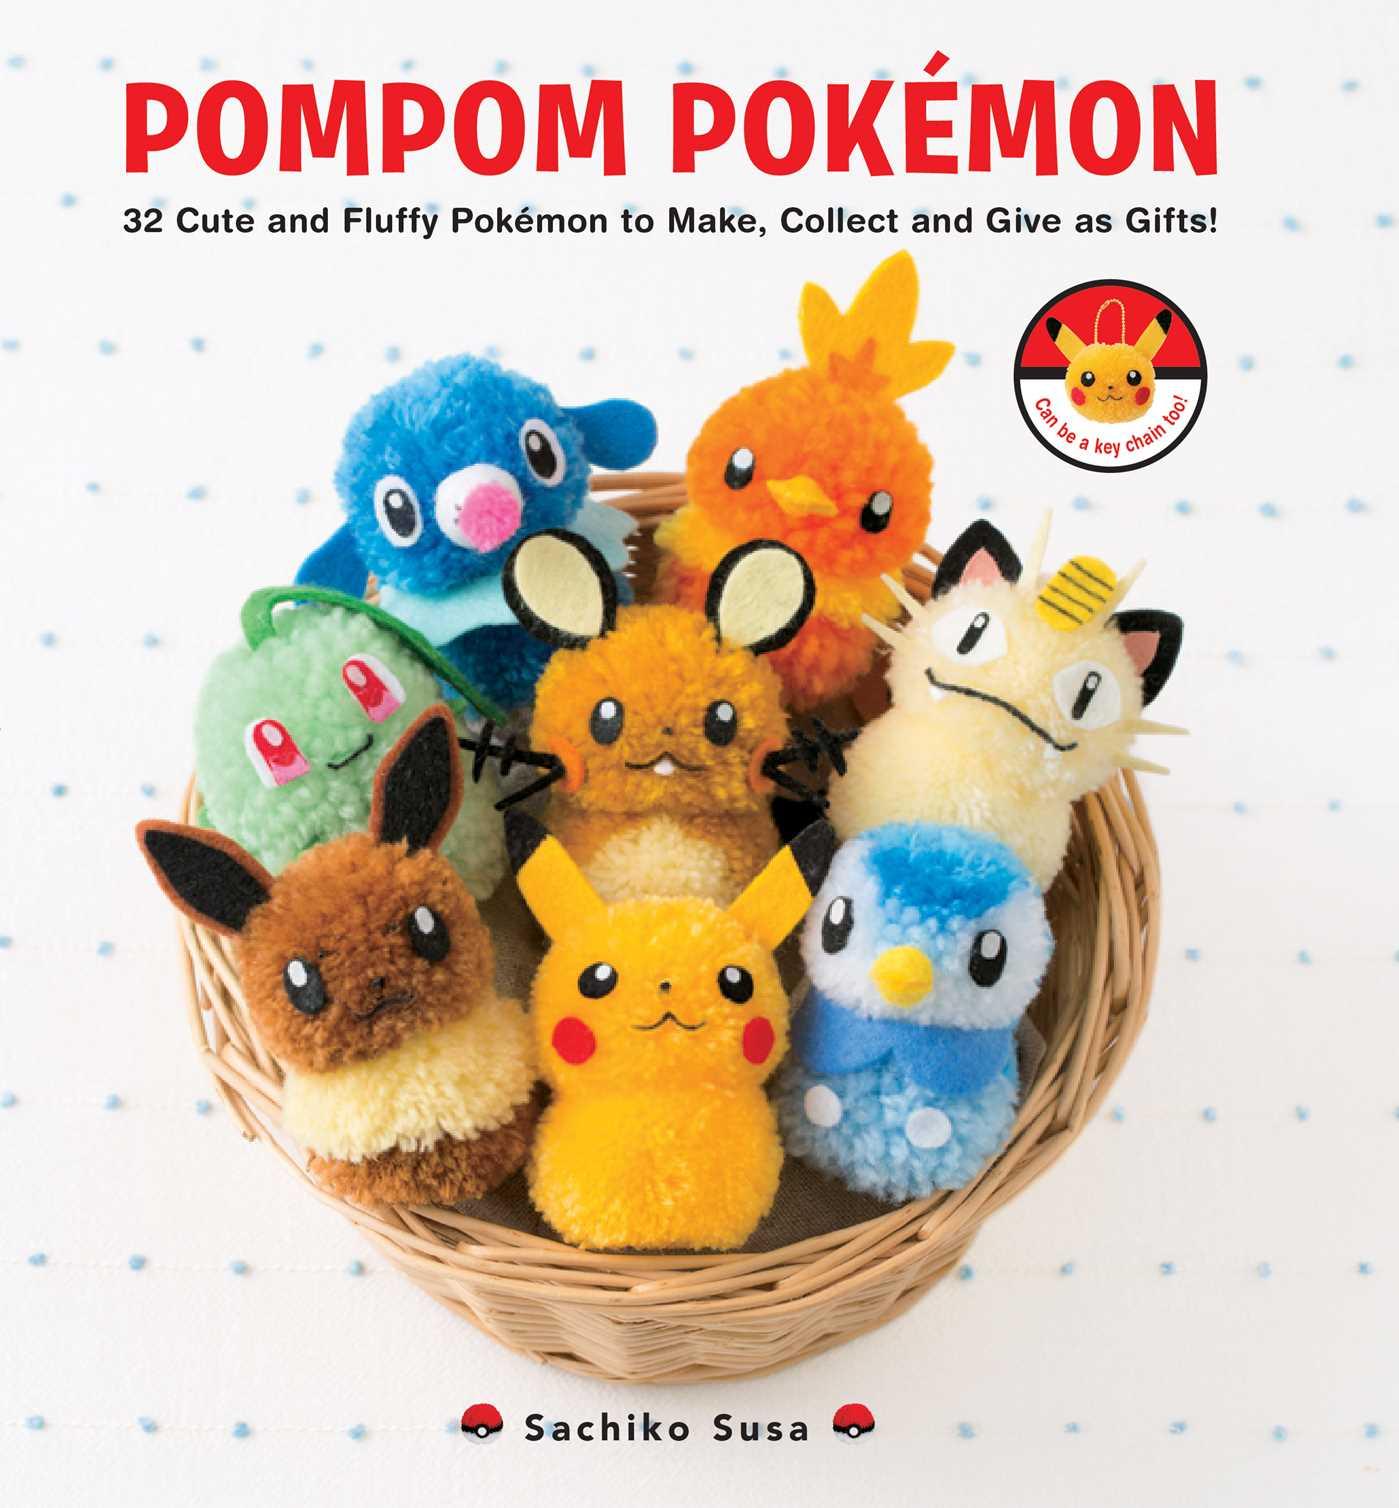 Pompom pokemon 9781974700684 hr